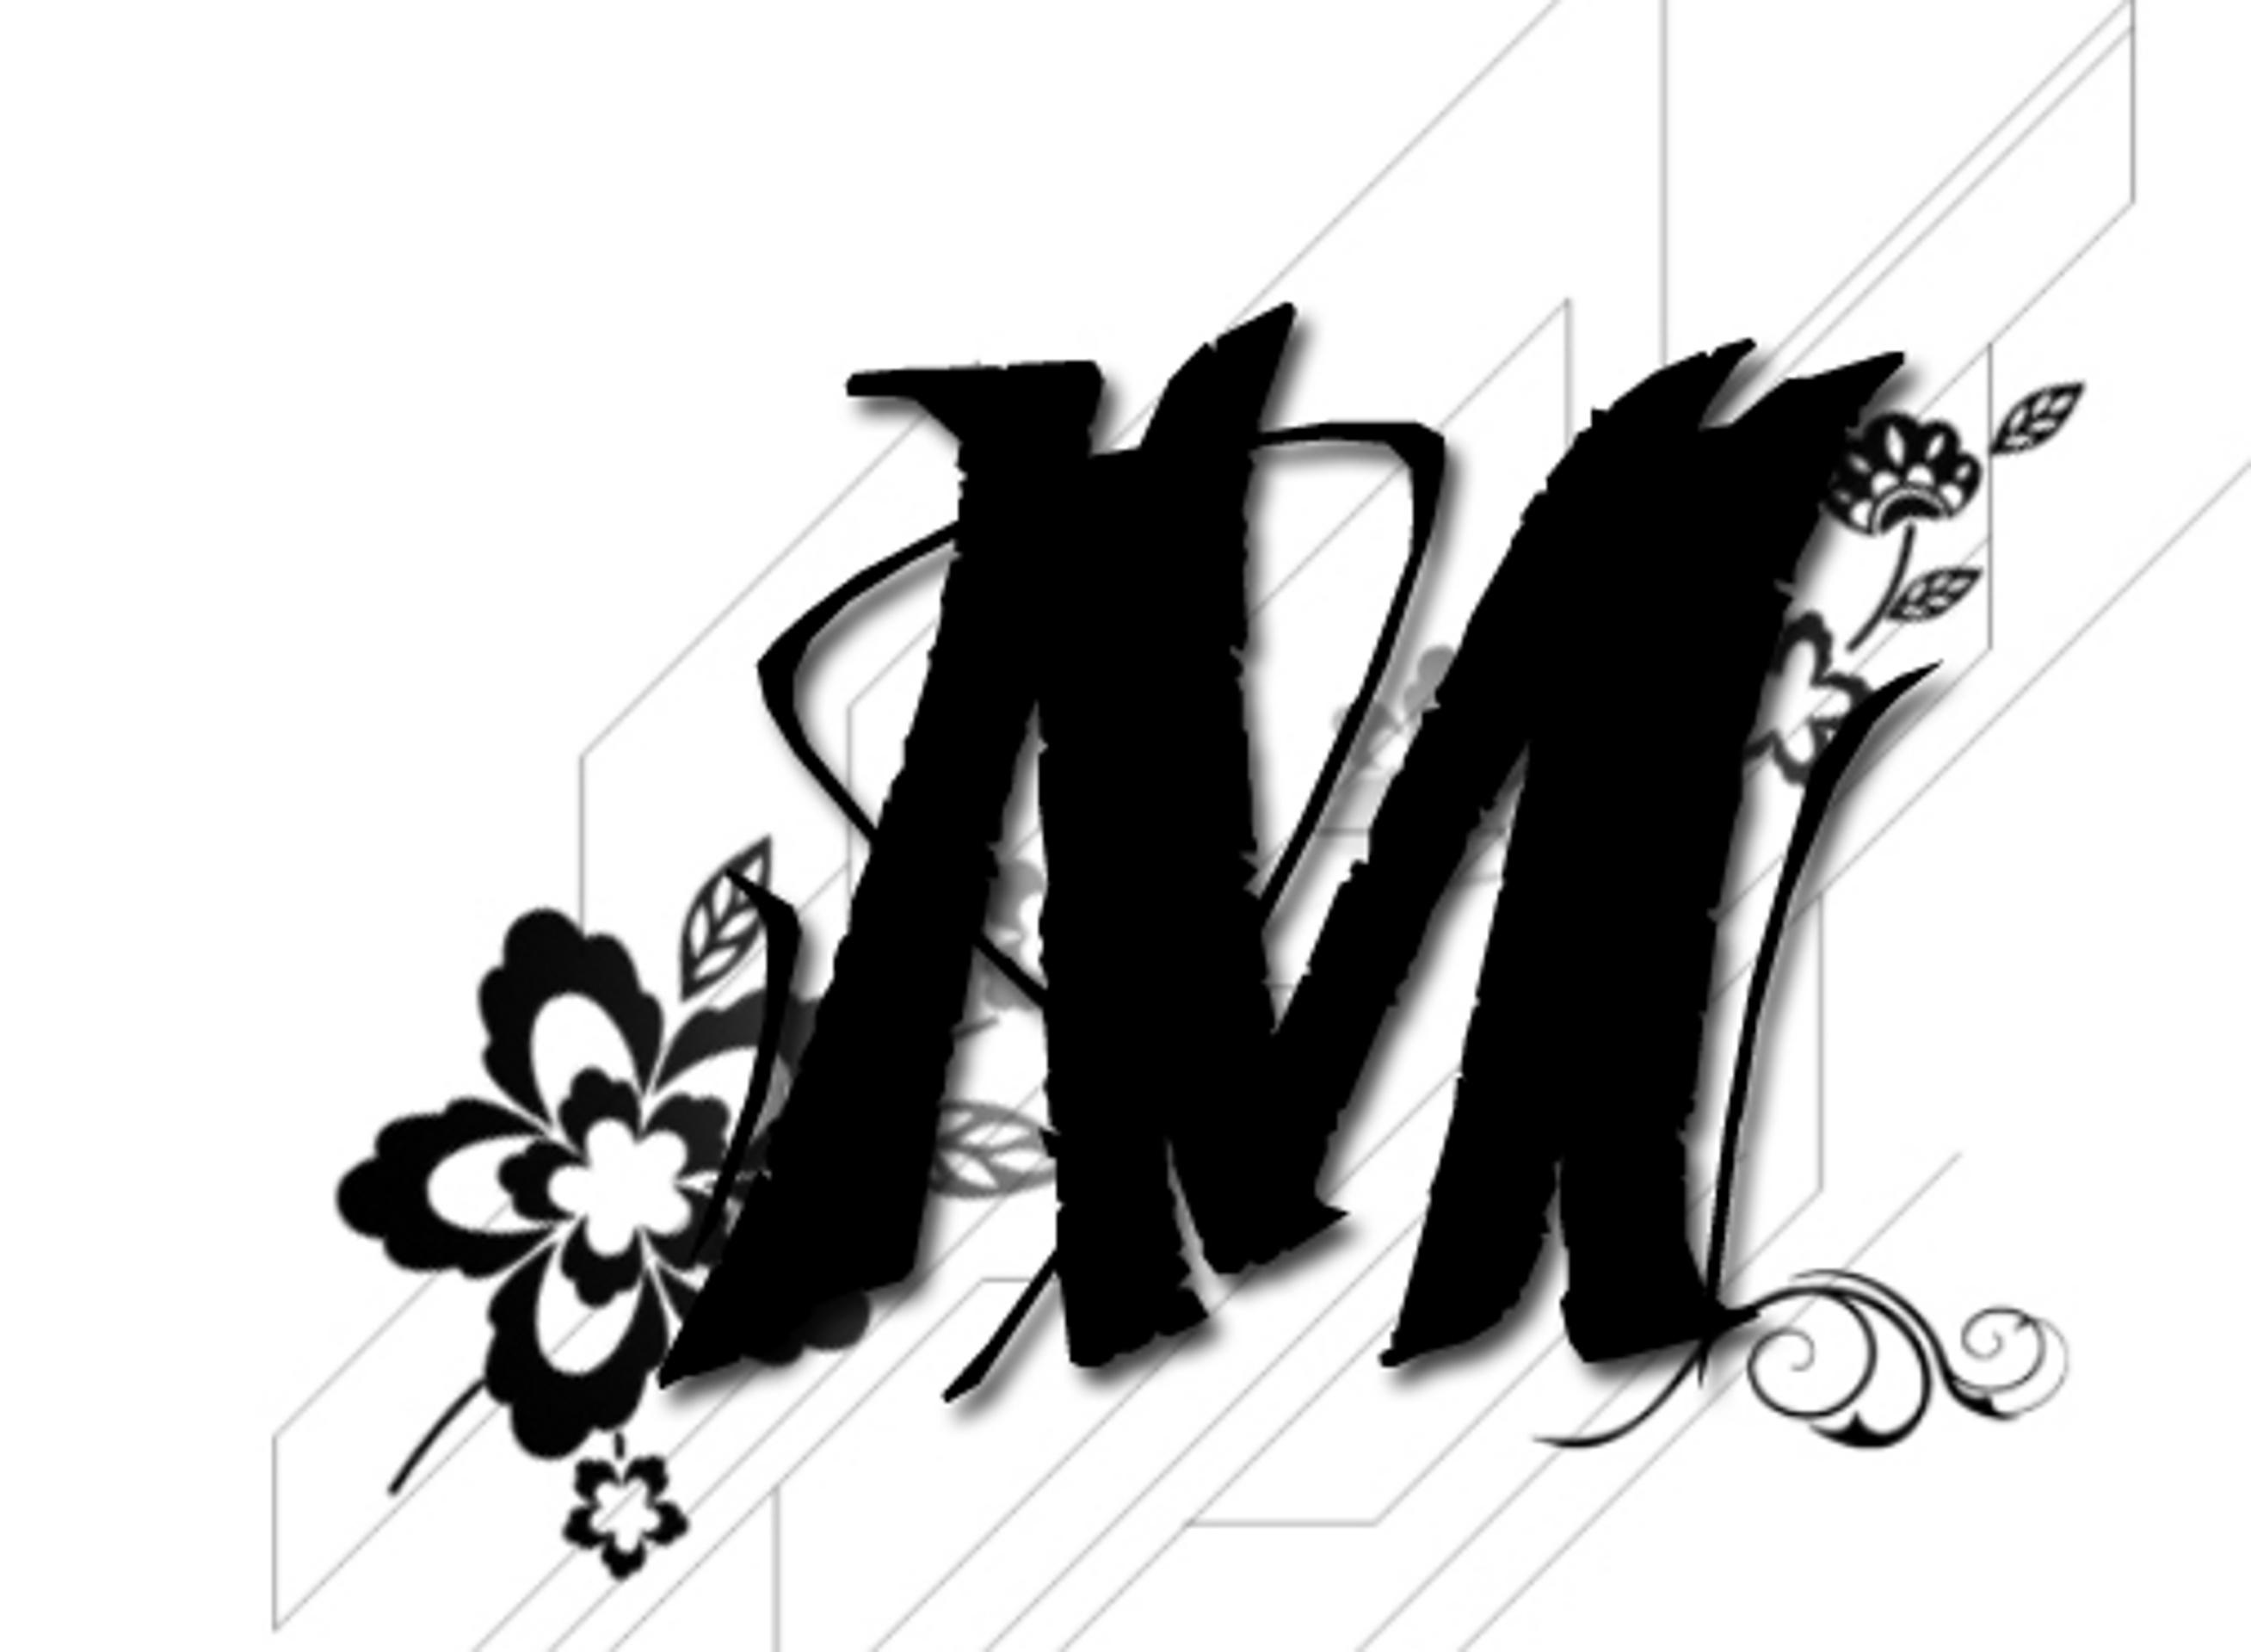 M Letter Wallpapers Desktop Letter M Wallpapers - ...